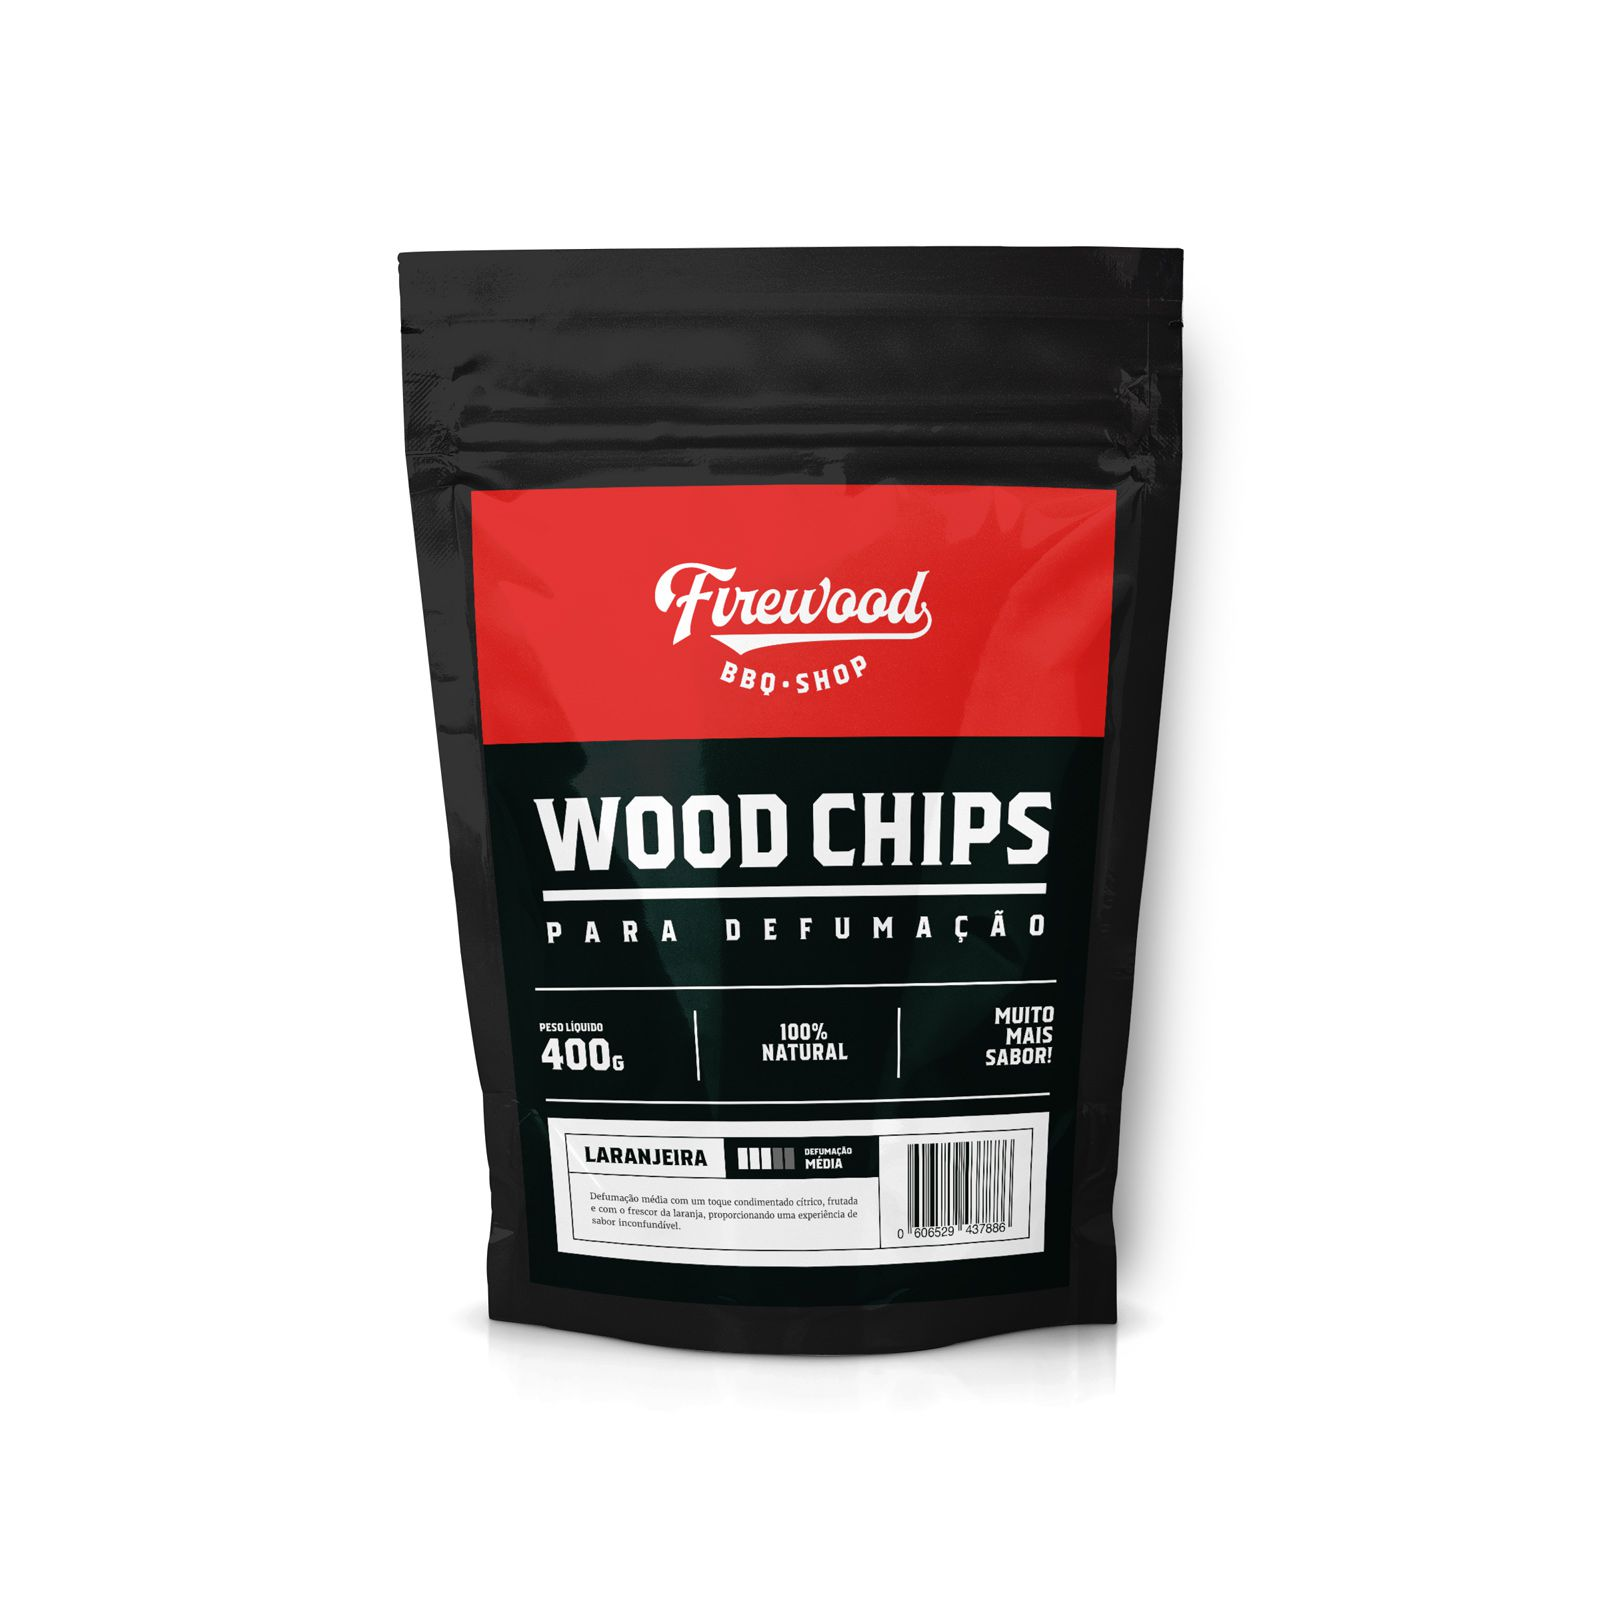 Defumador Inox + Wood Chip Macieira